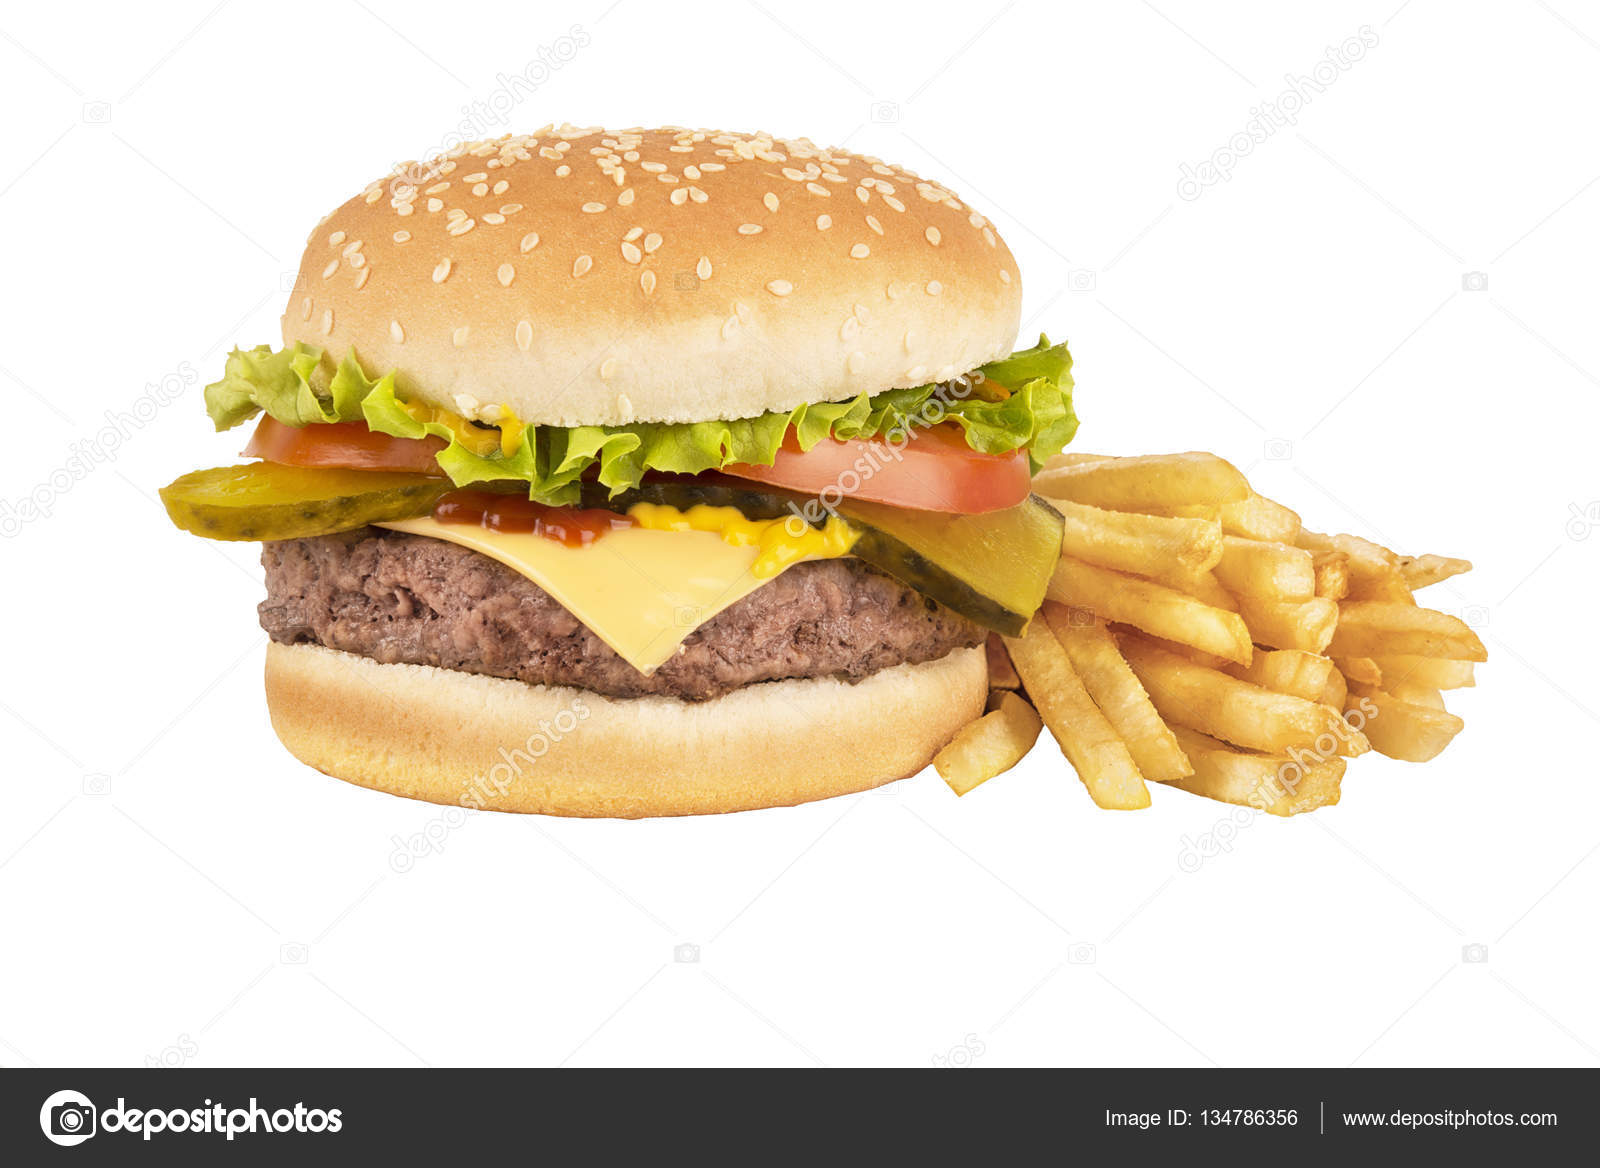 Fotos: Hamburguesas De Burger King